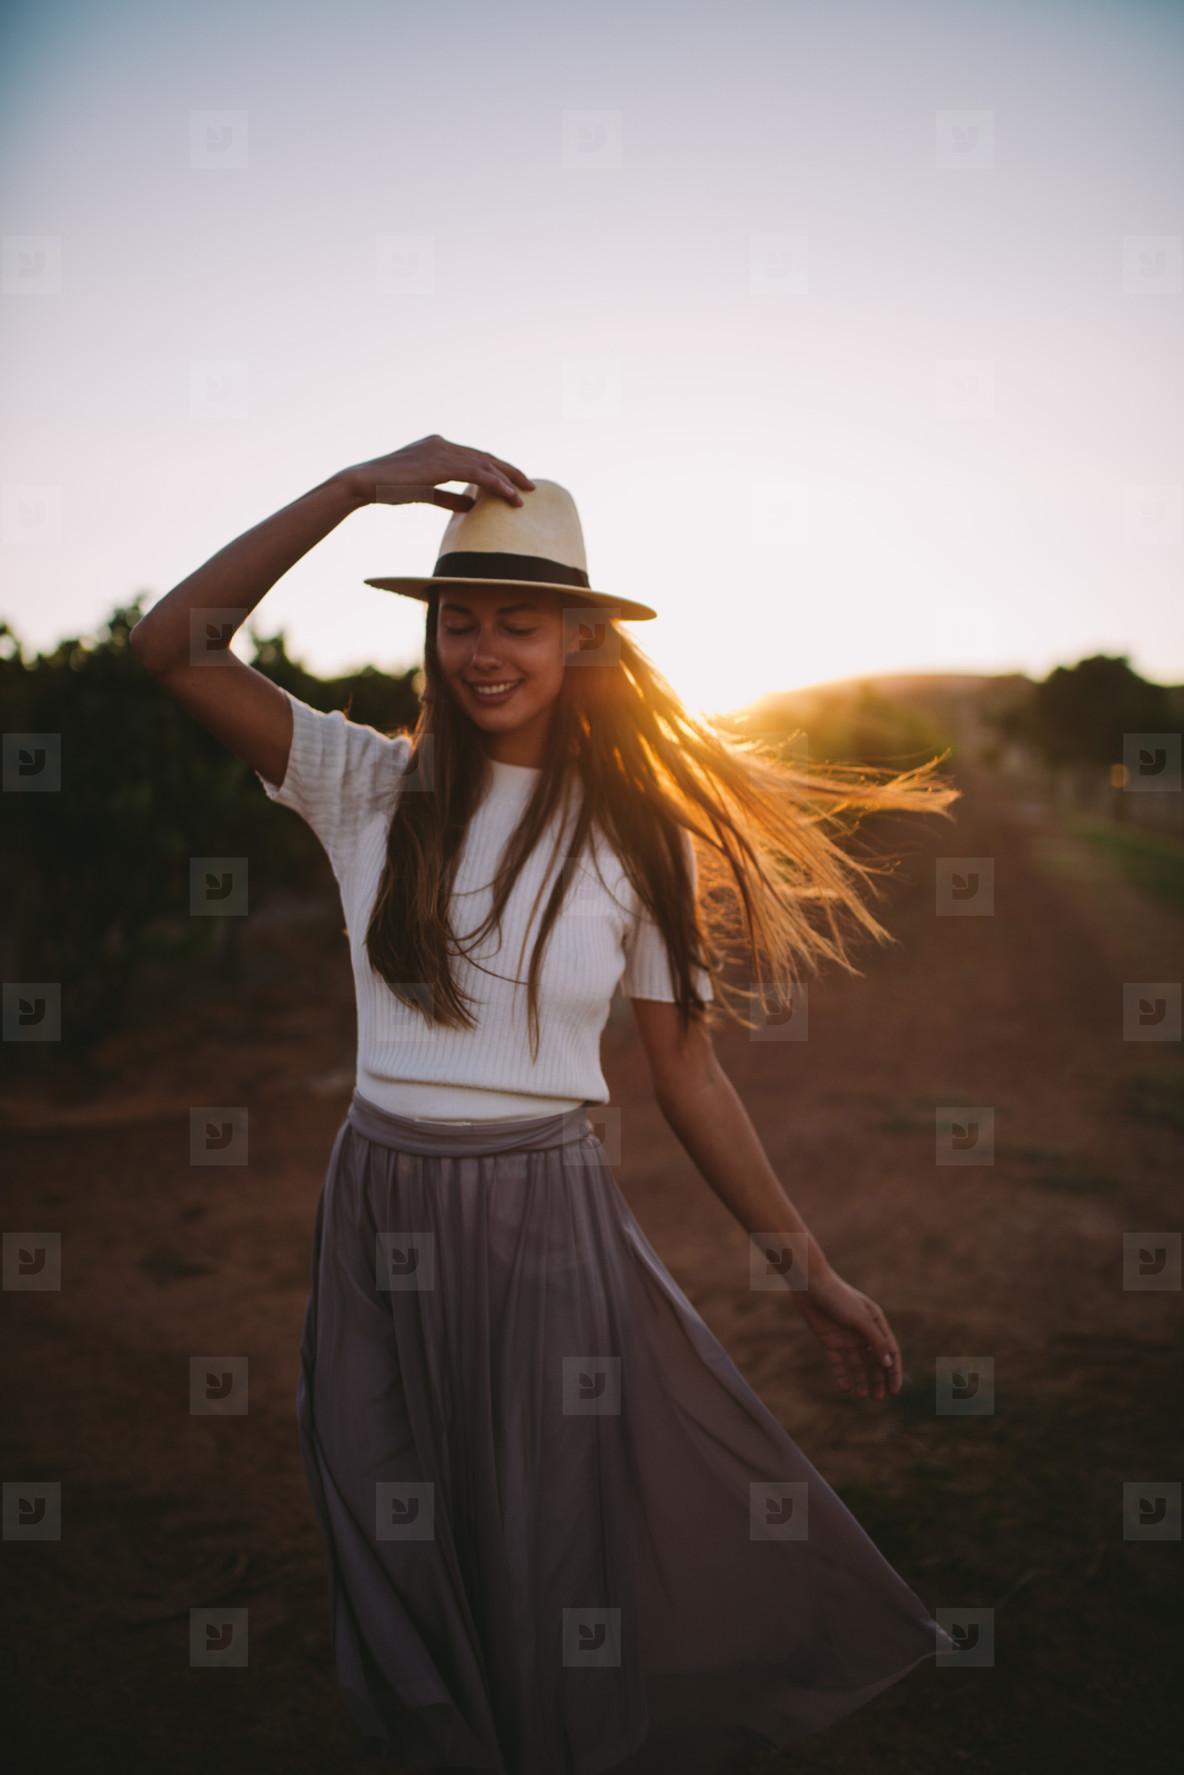 Countrygirl on farmland in sunset